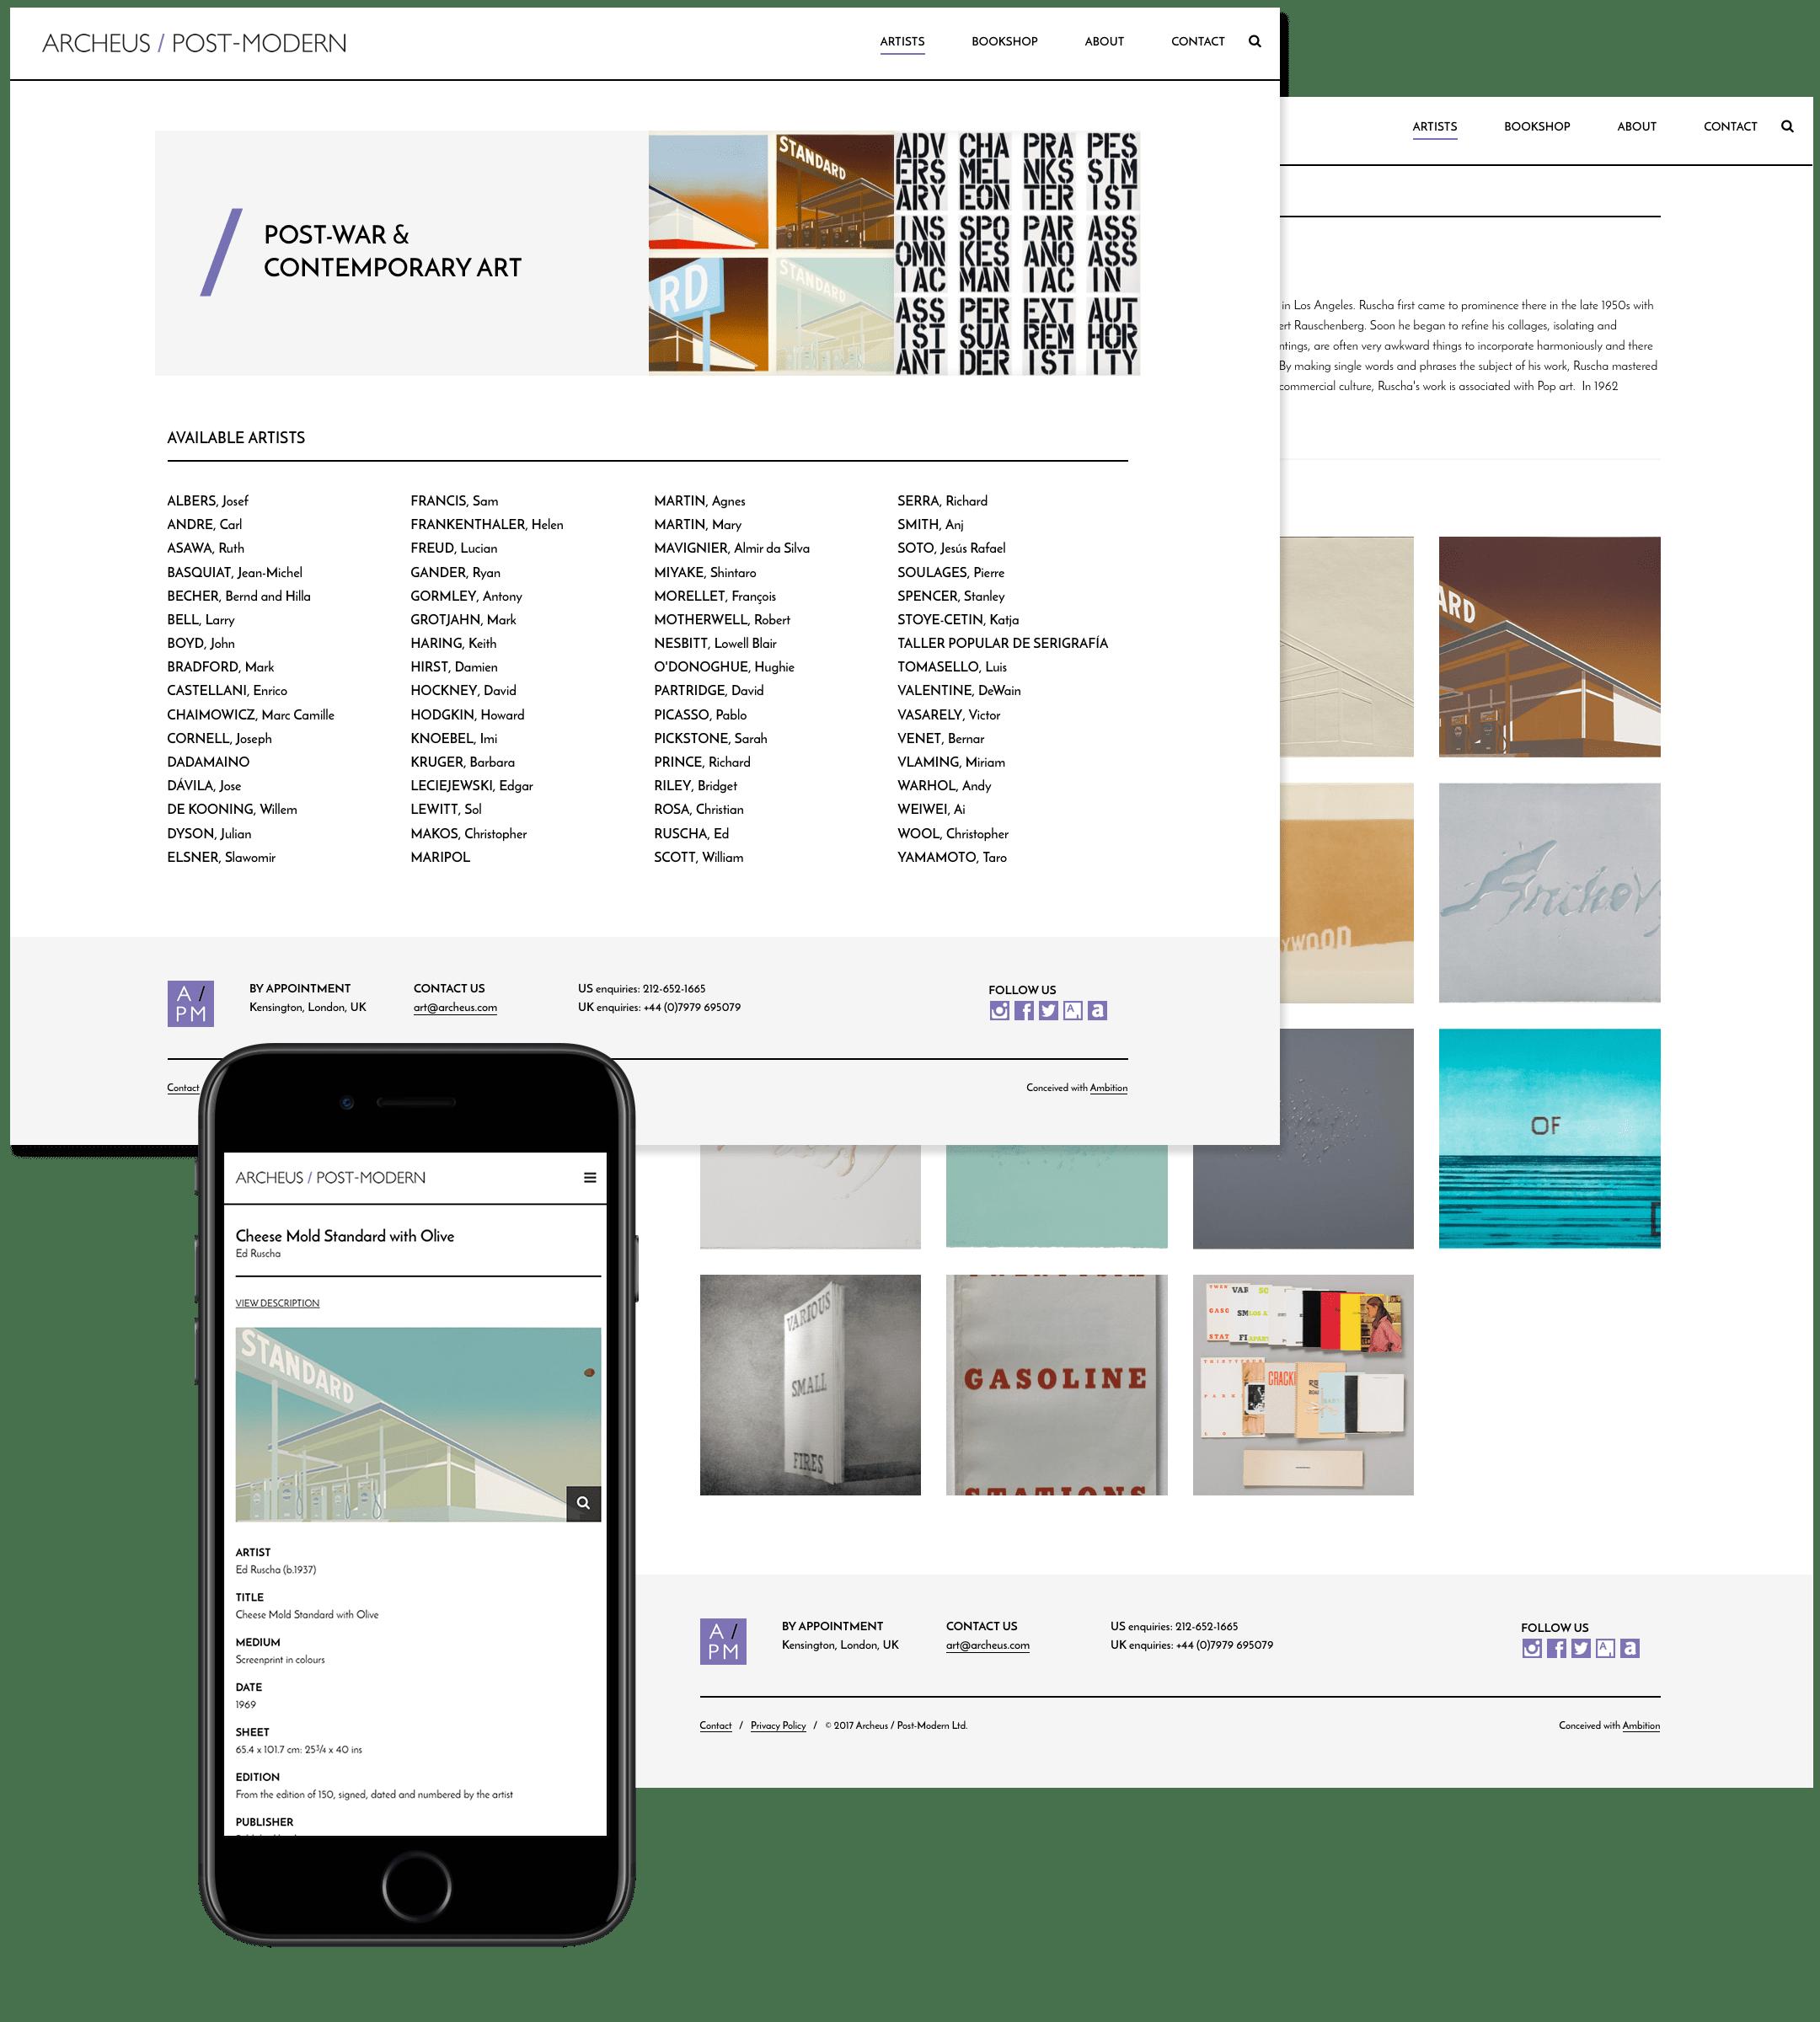 The Idea of Web Design - Fundamental Principles of Designing a Website